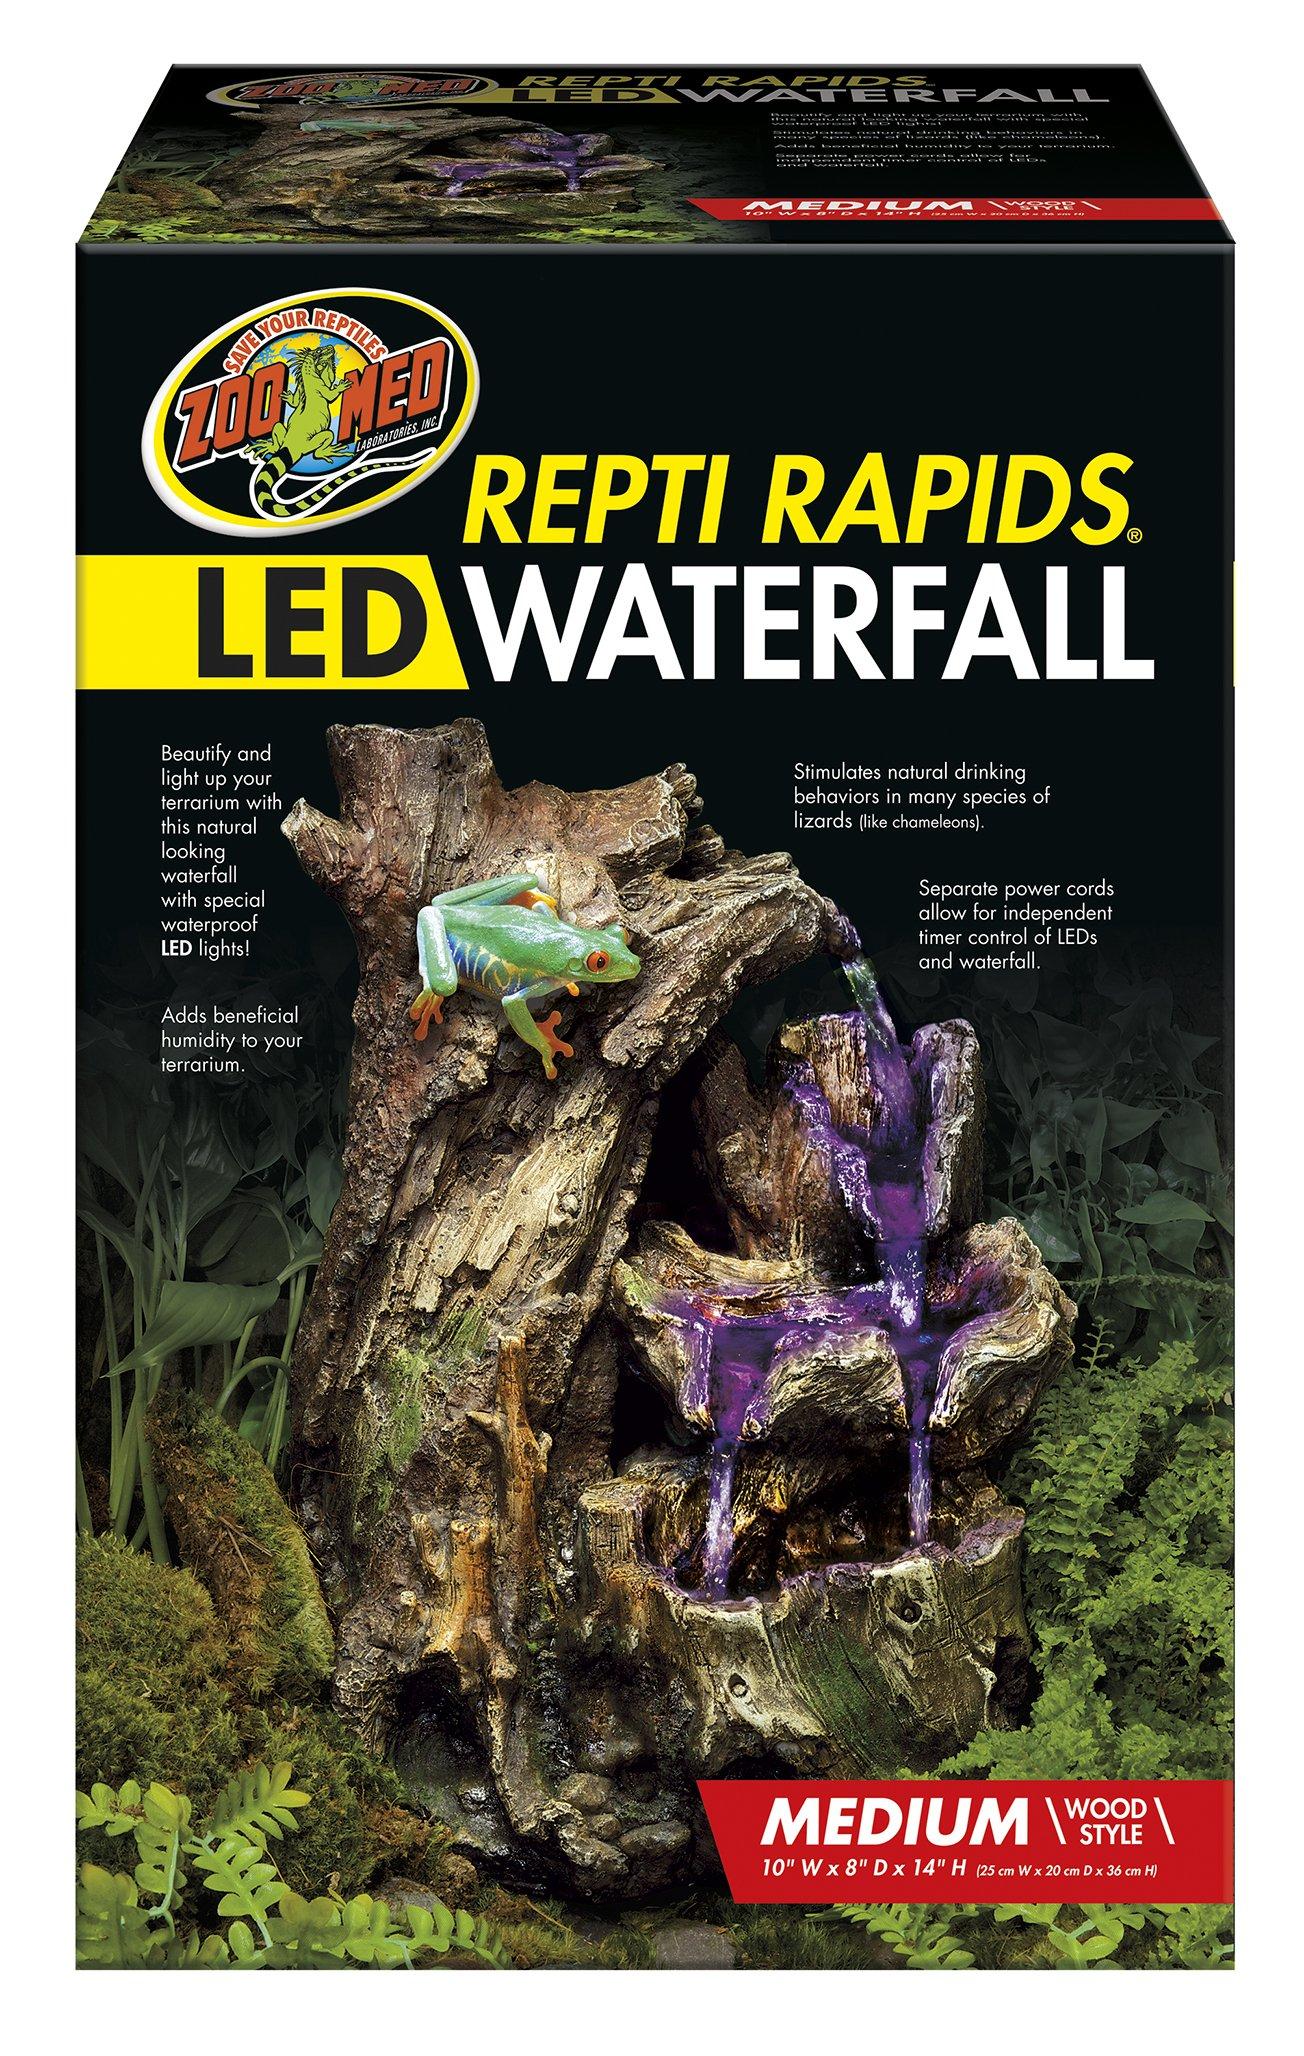 Zoo Med 26375 Repti Rapids LED Waterfall Wood Style, Medium